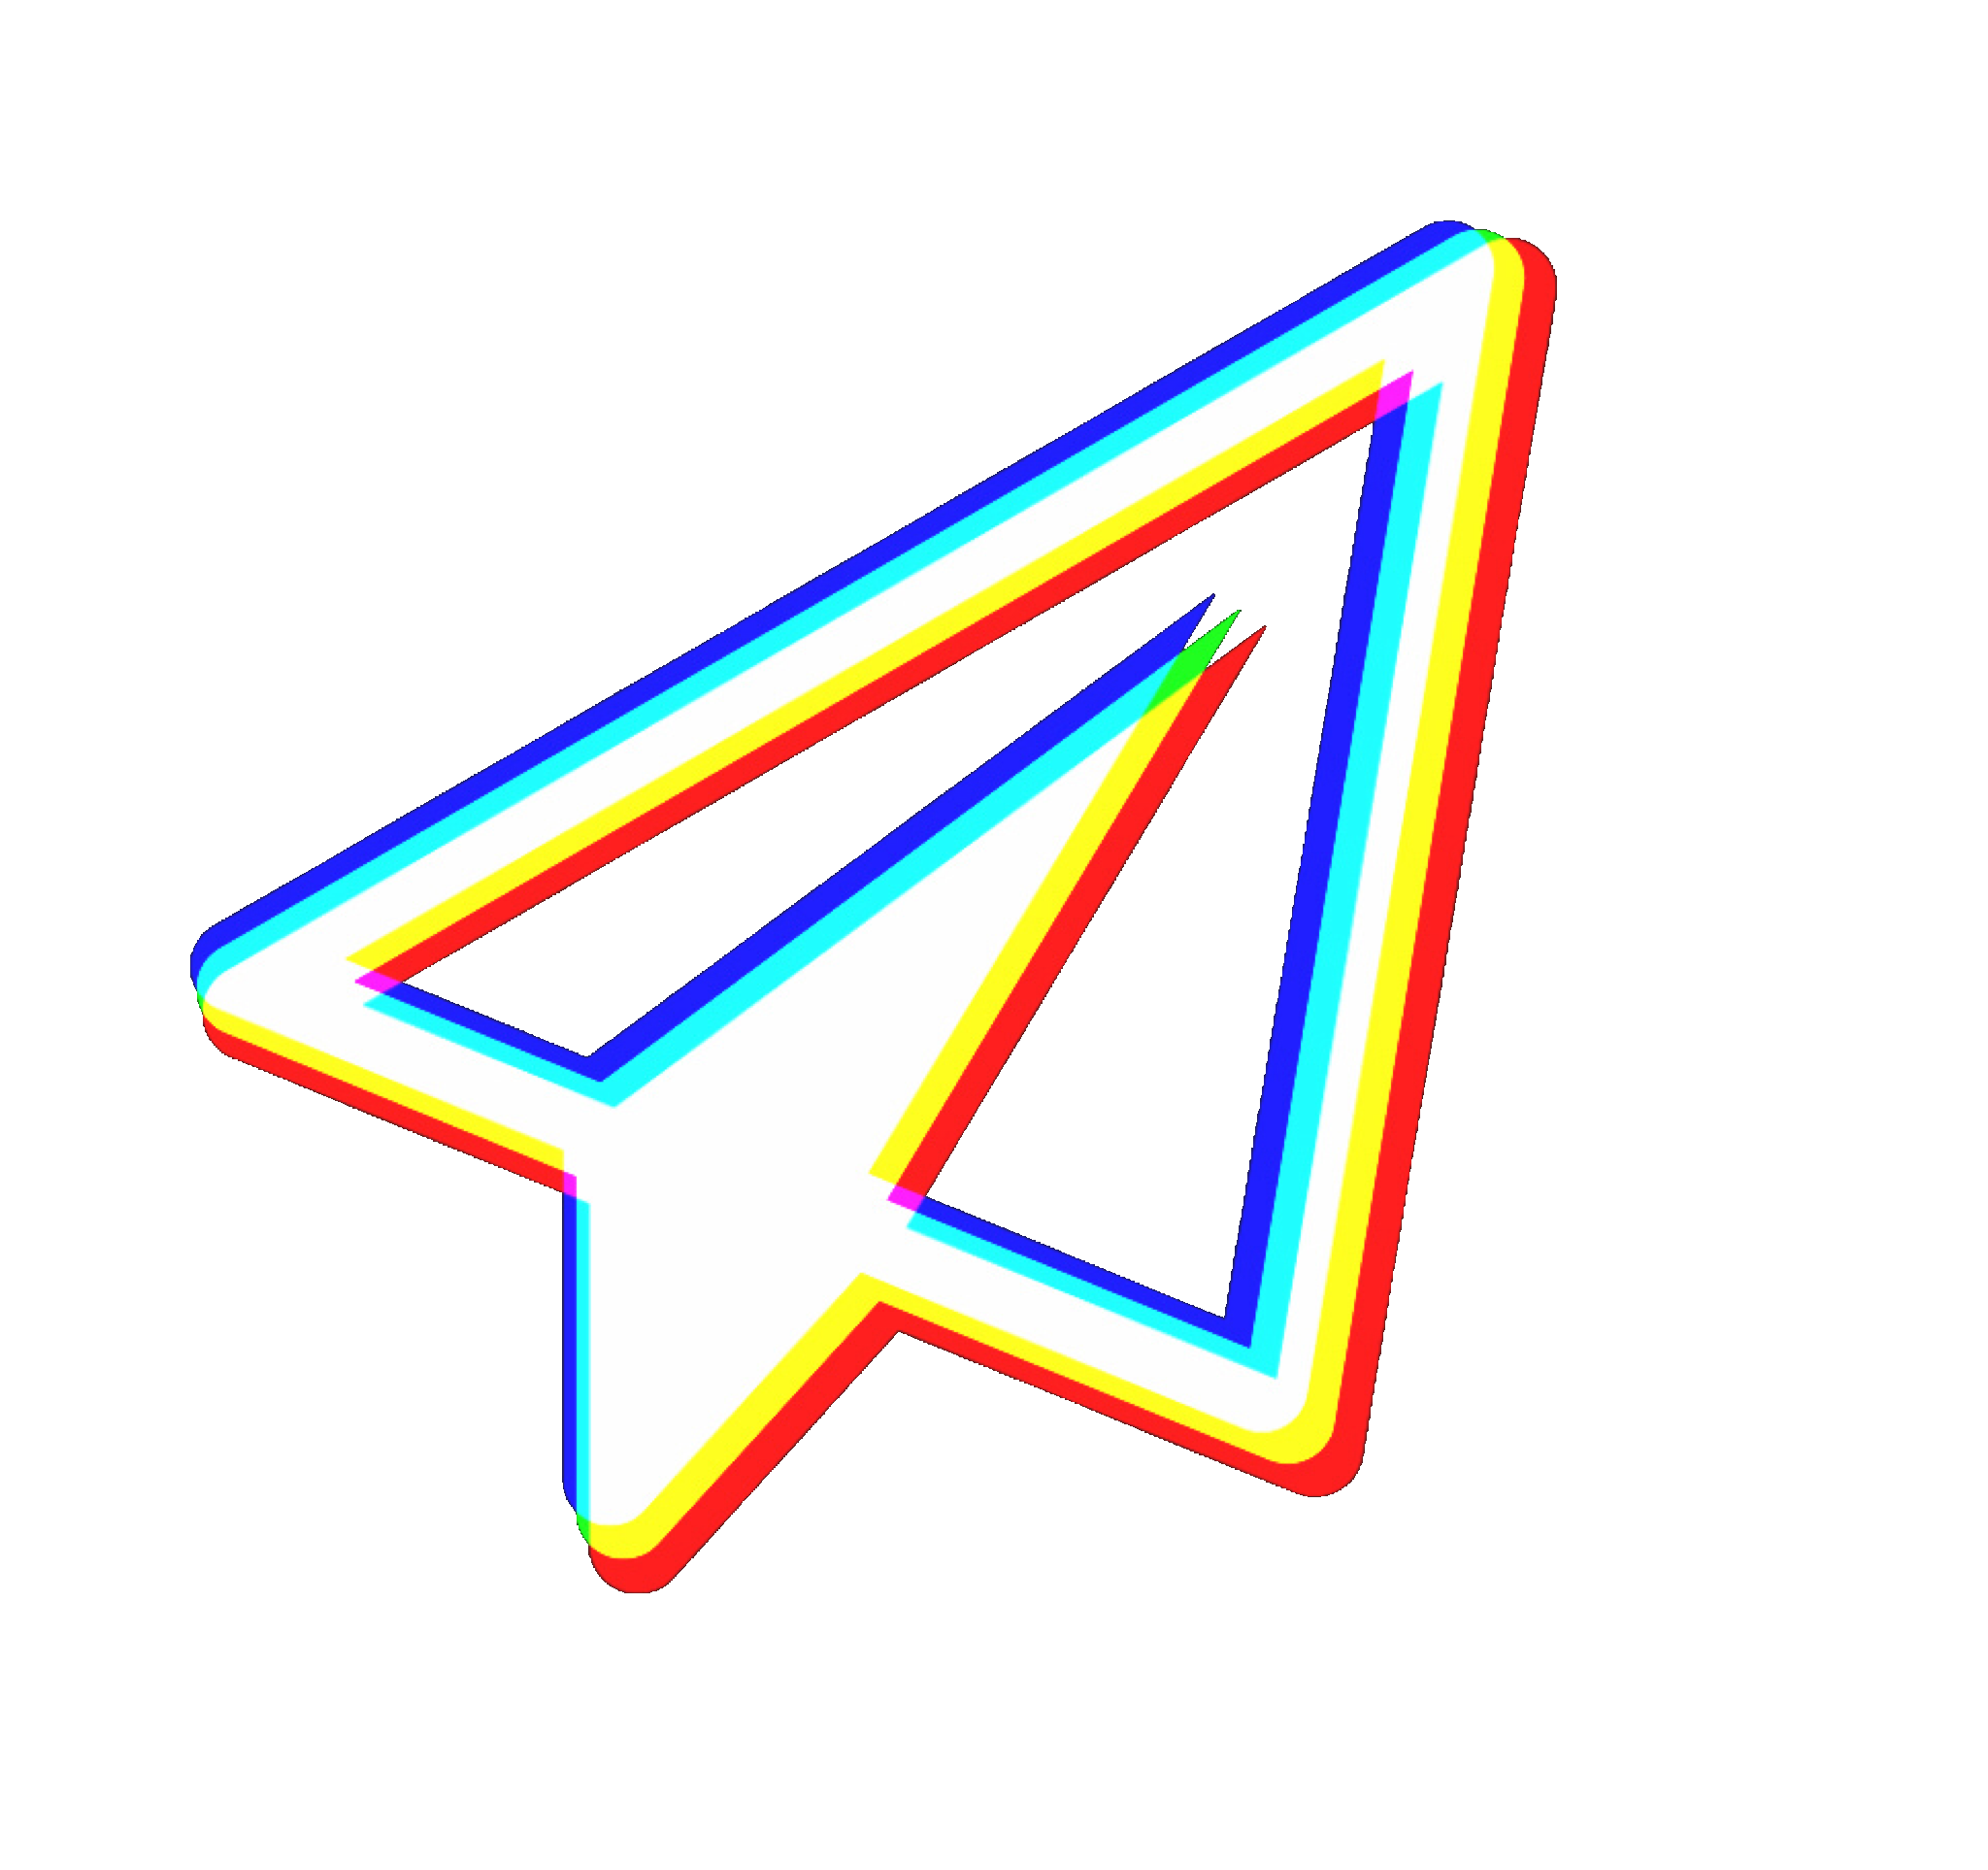 Paper Plane Airplane Mouse Arrow Vhs 3d 3deffect Tumblr